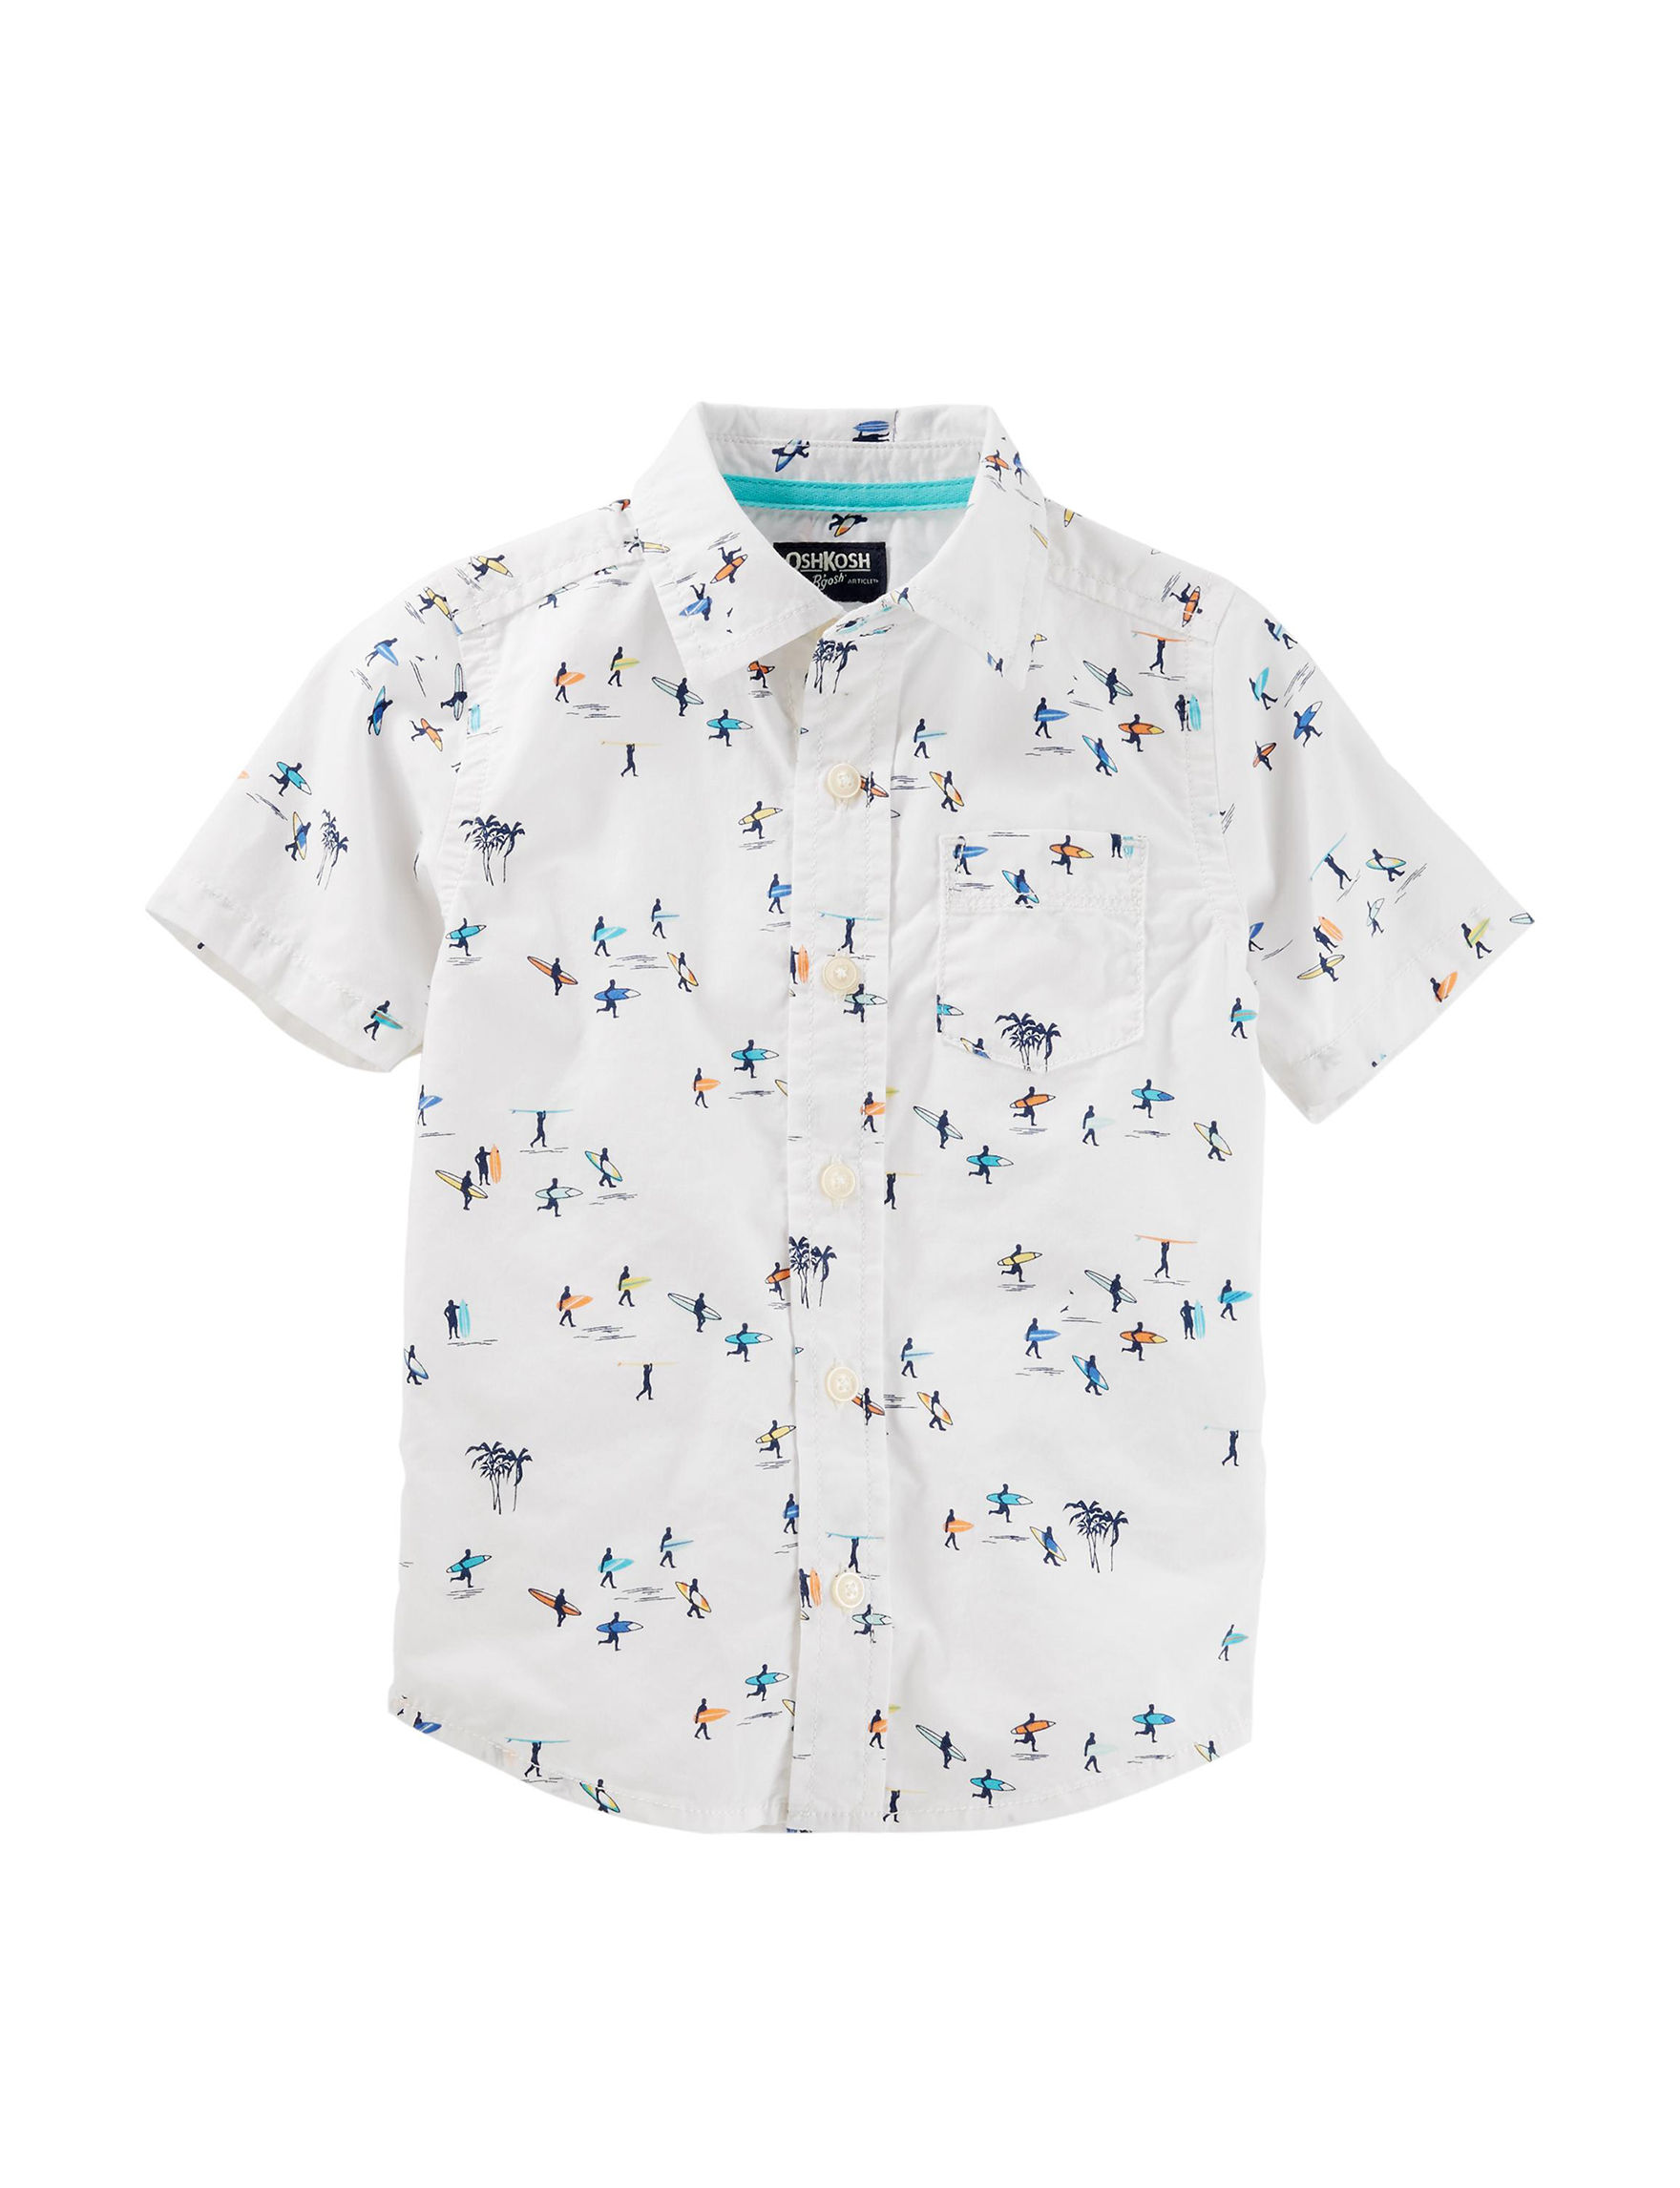 Oshkosh B'Gosh White / Multi Casual Button Down Shirts